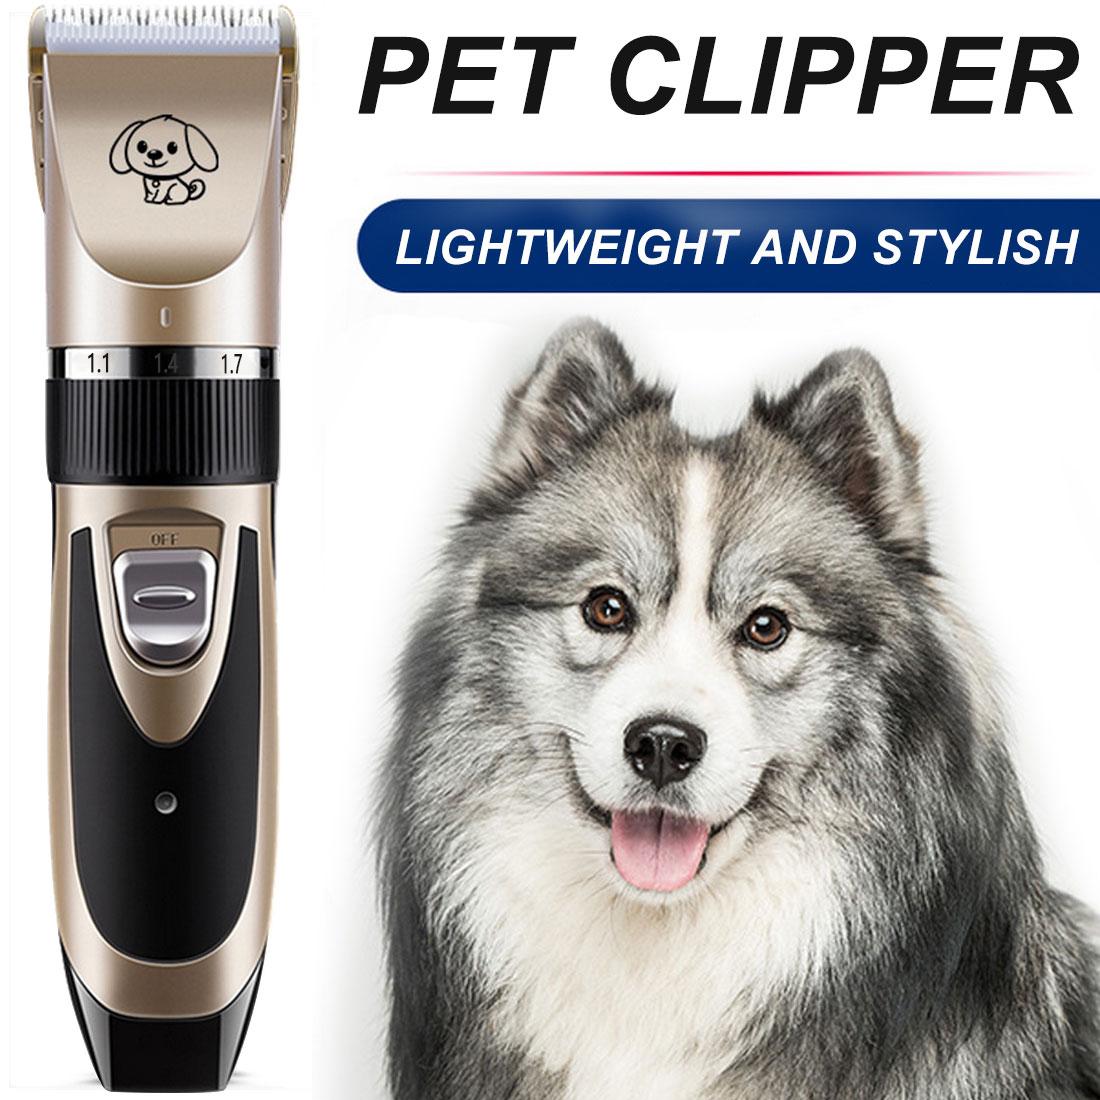 Cortapelos para Perros Clippers perro Peluquer/ía Canina Profesional Clippers sin cable de bajo ruido sin cable Clippers perro de mascota Trimmer preparaci/ón del perro Clippers Kit for abrigos perros